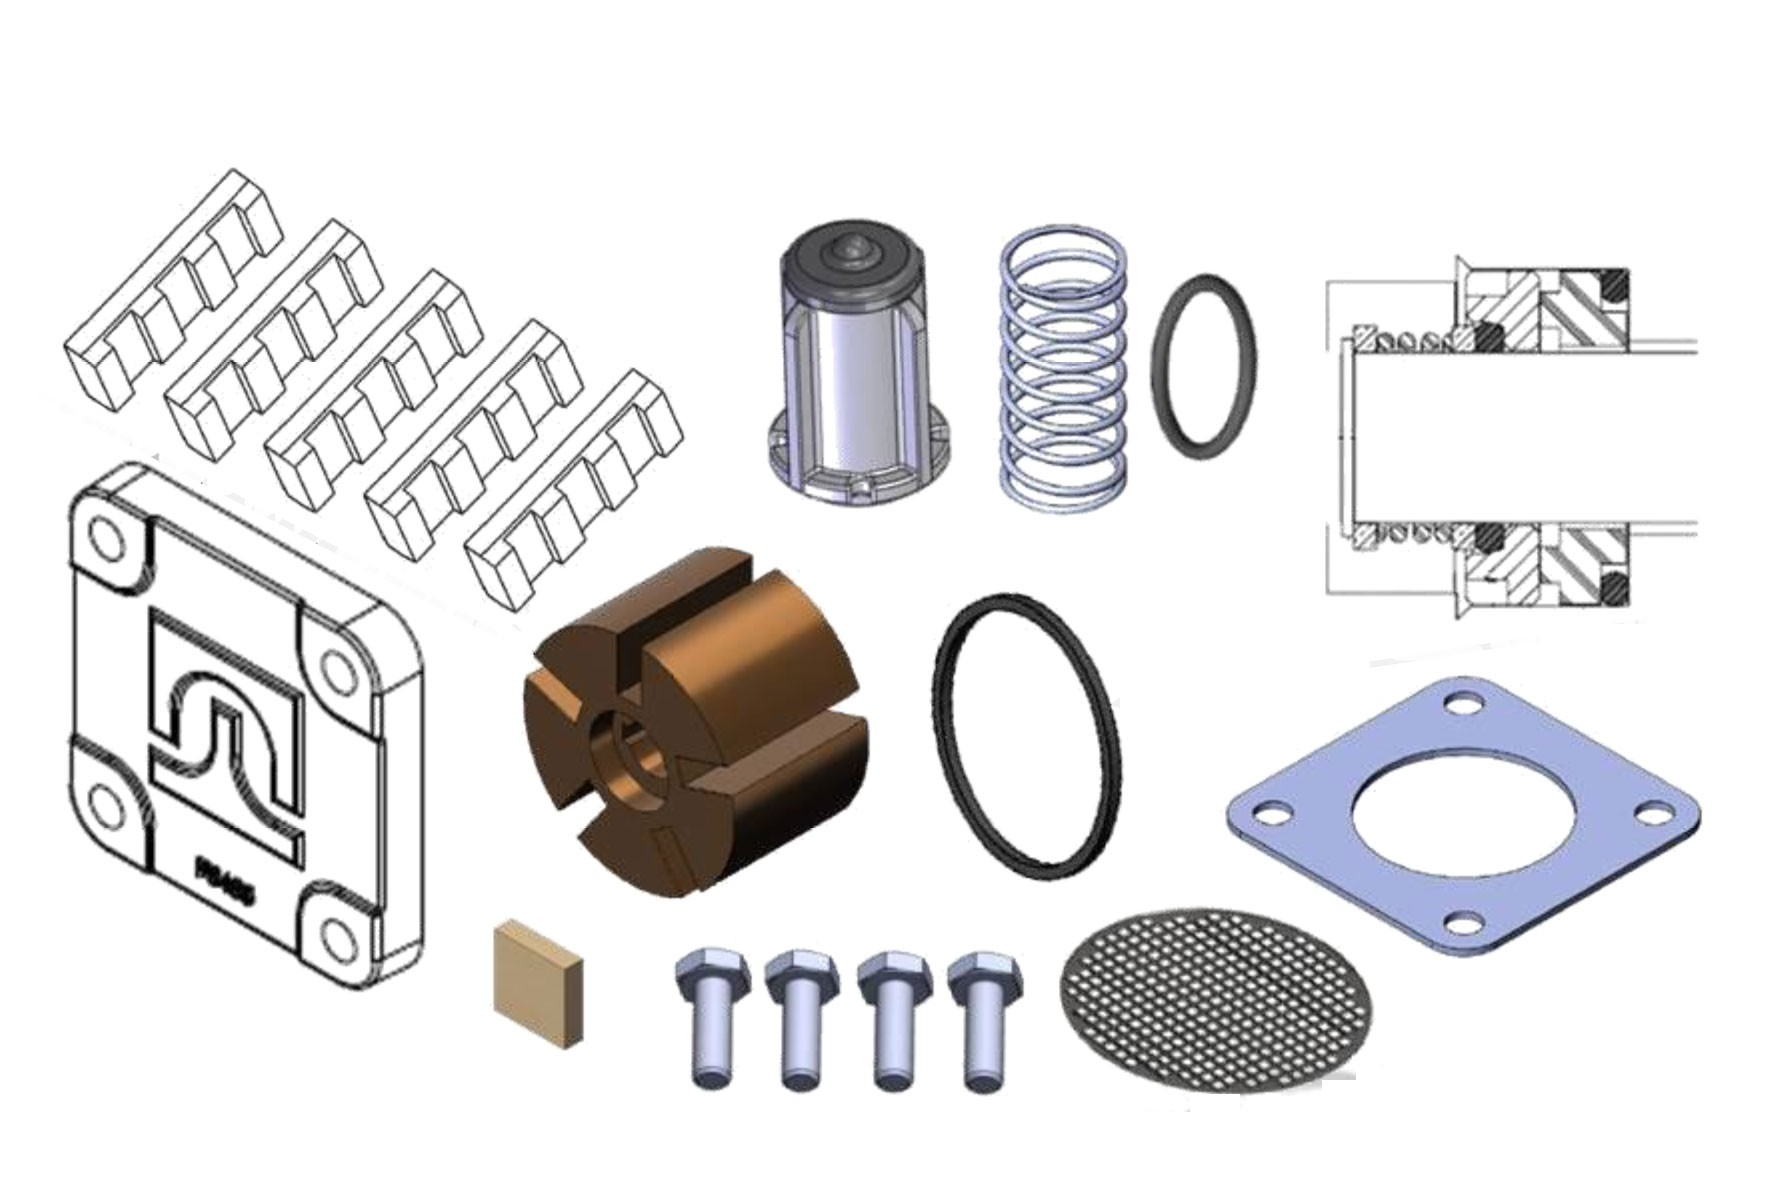 FIll-Rite 1200KTG8572 Rebuild Kit for FR1200B and FR2400B Pumps